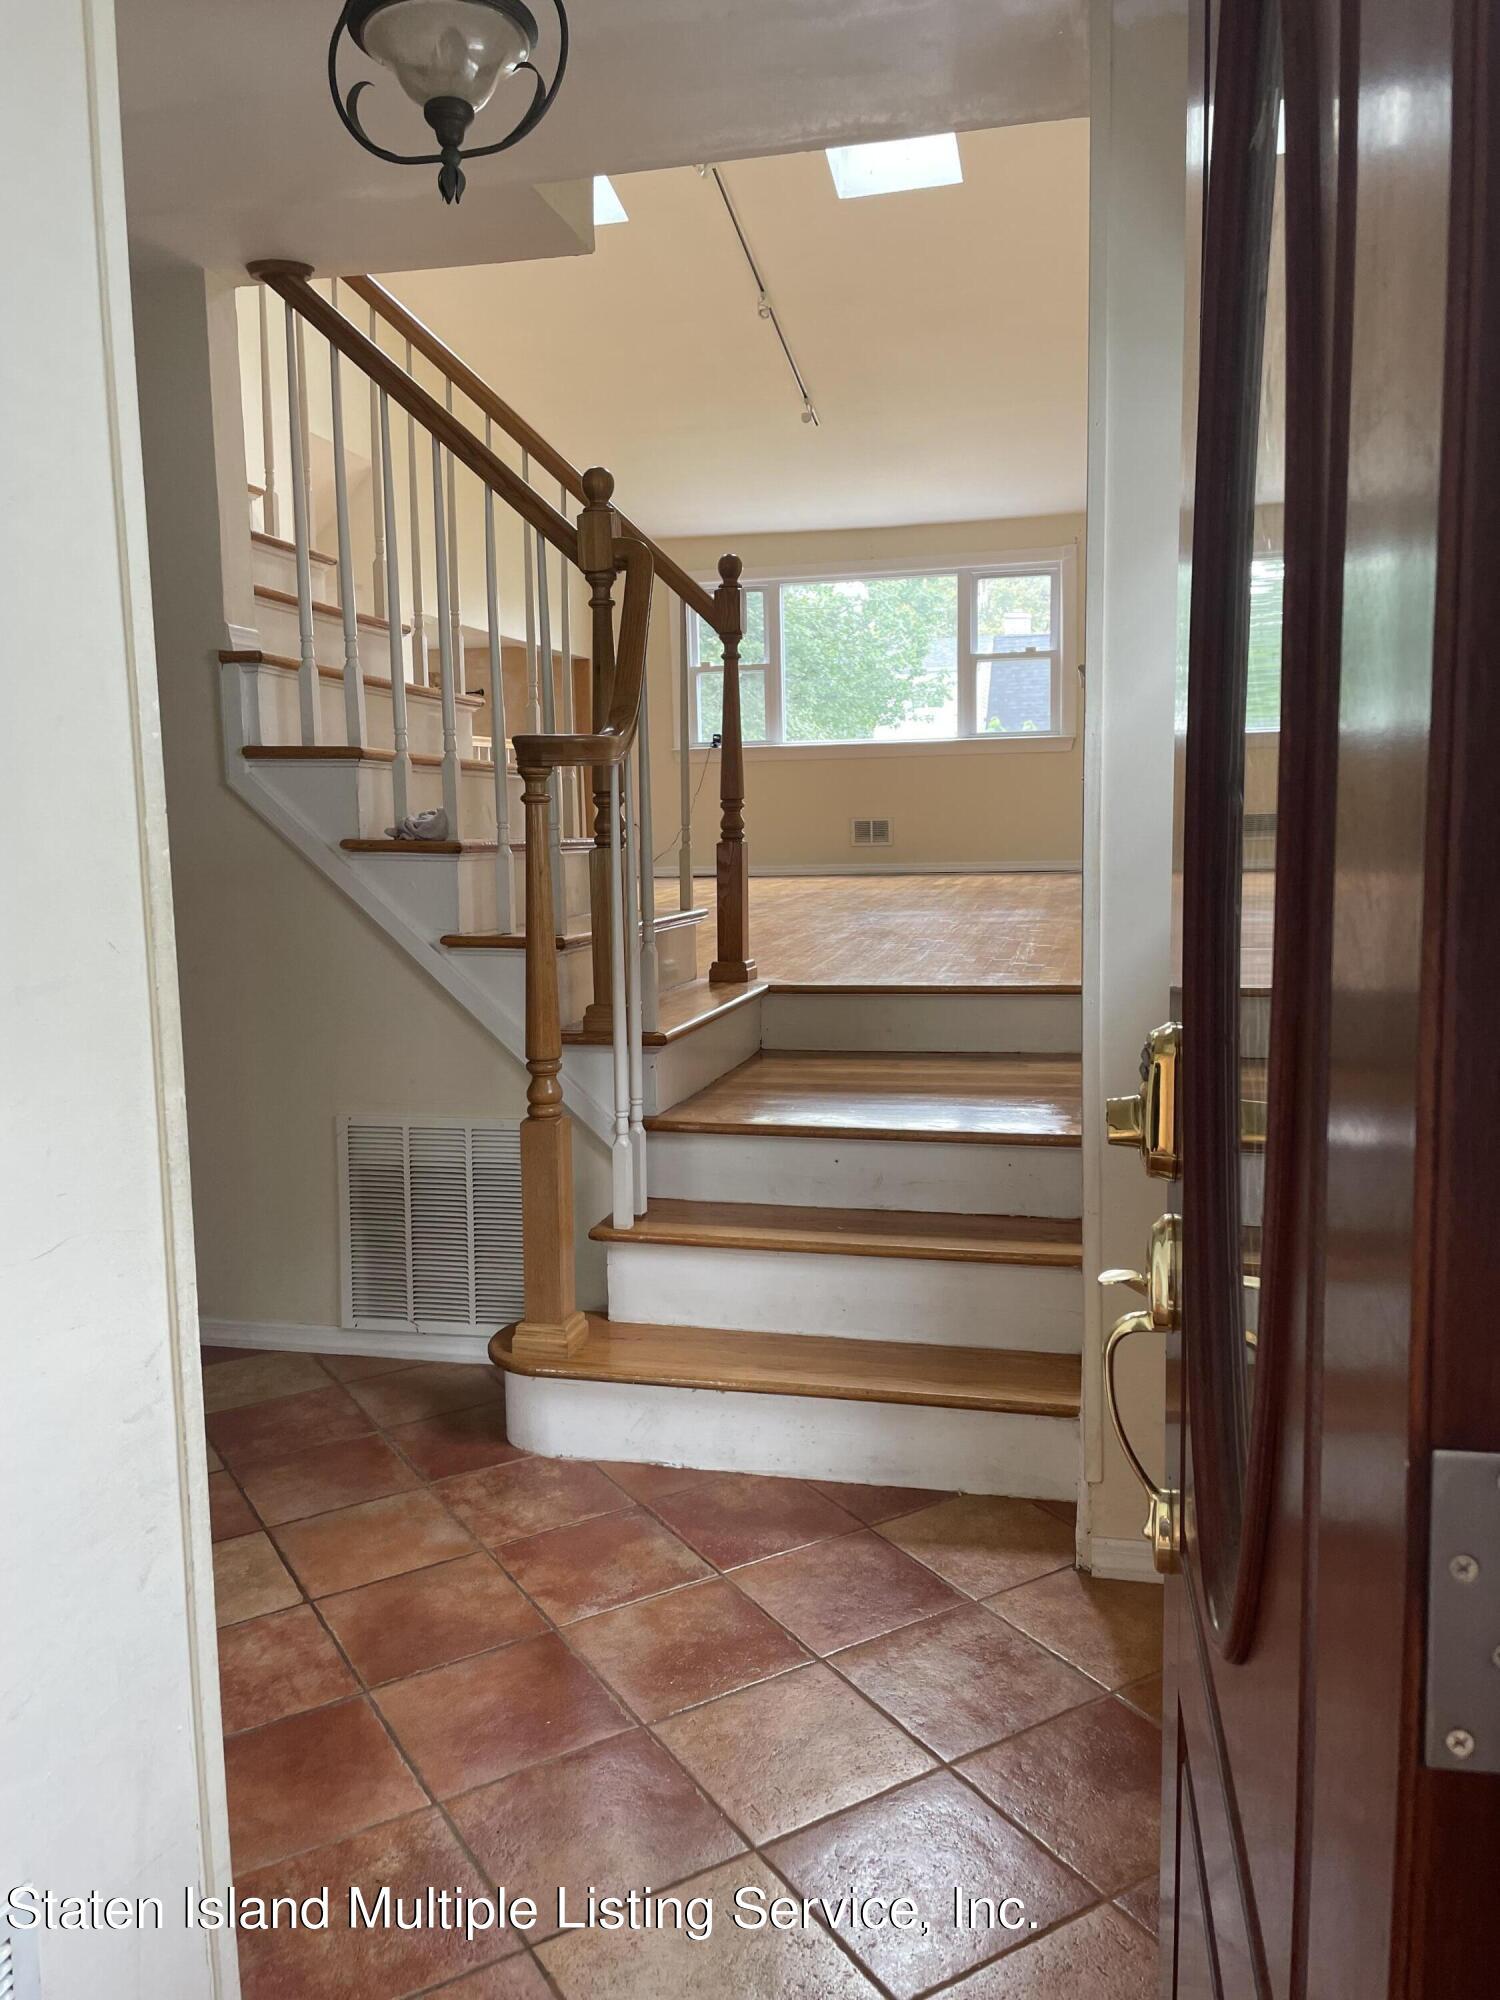 Single Family - Detached 484 Mountainview Avenue  Staten Island, NY 10314, MLS-1147175-46